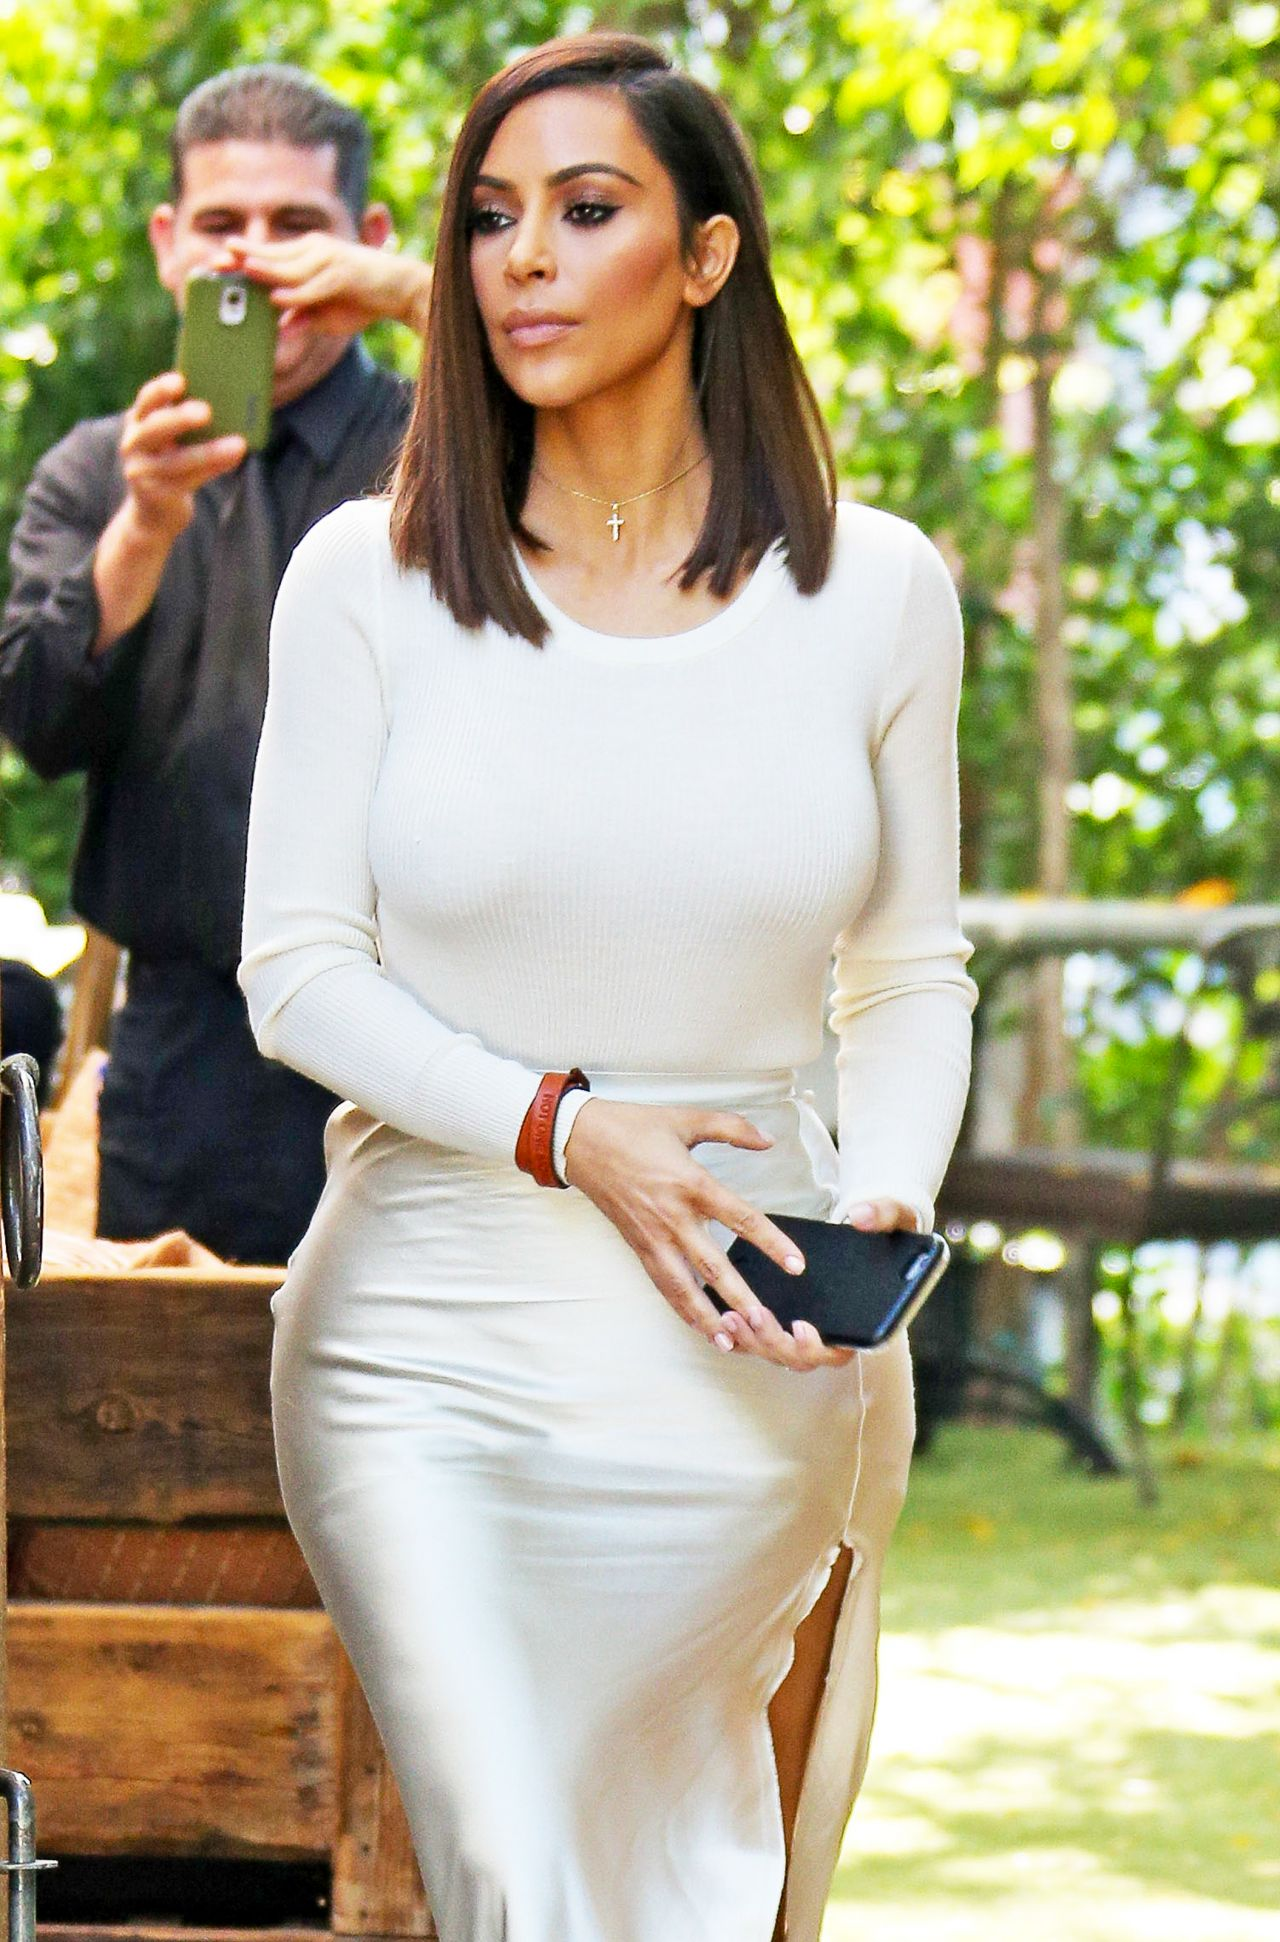 Kim Kardashian Classy Fashion - At The Villa Restaurant In -2195